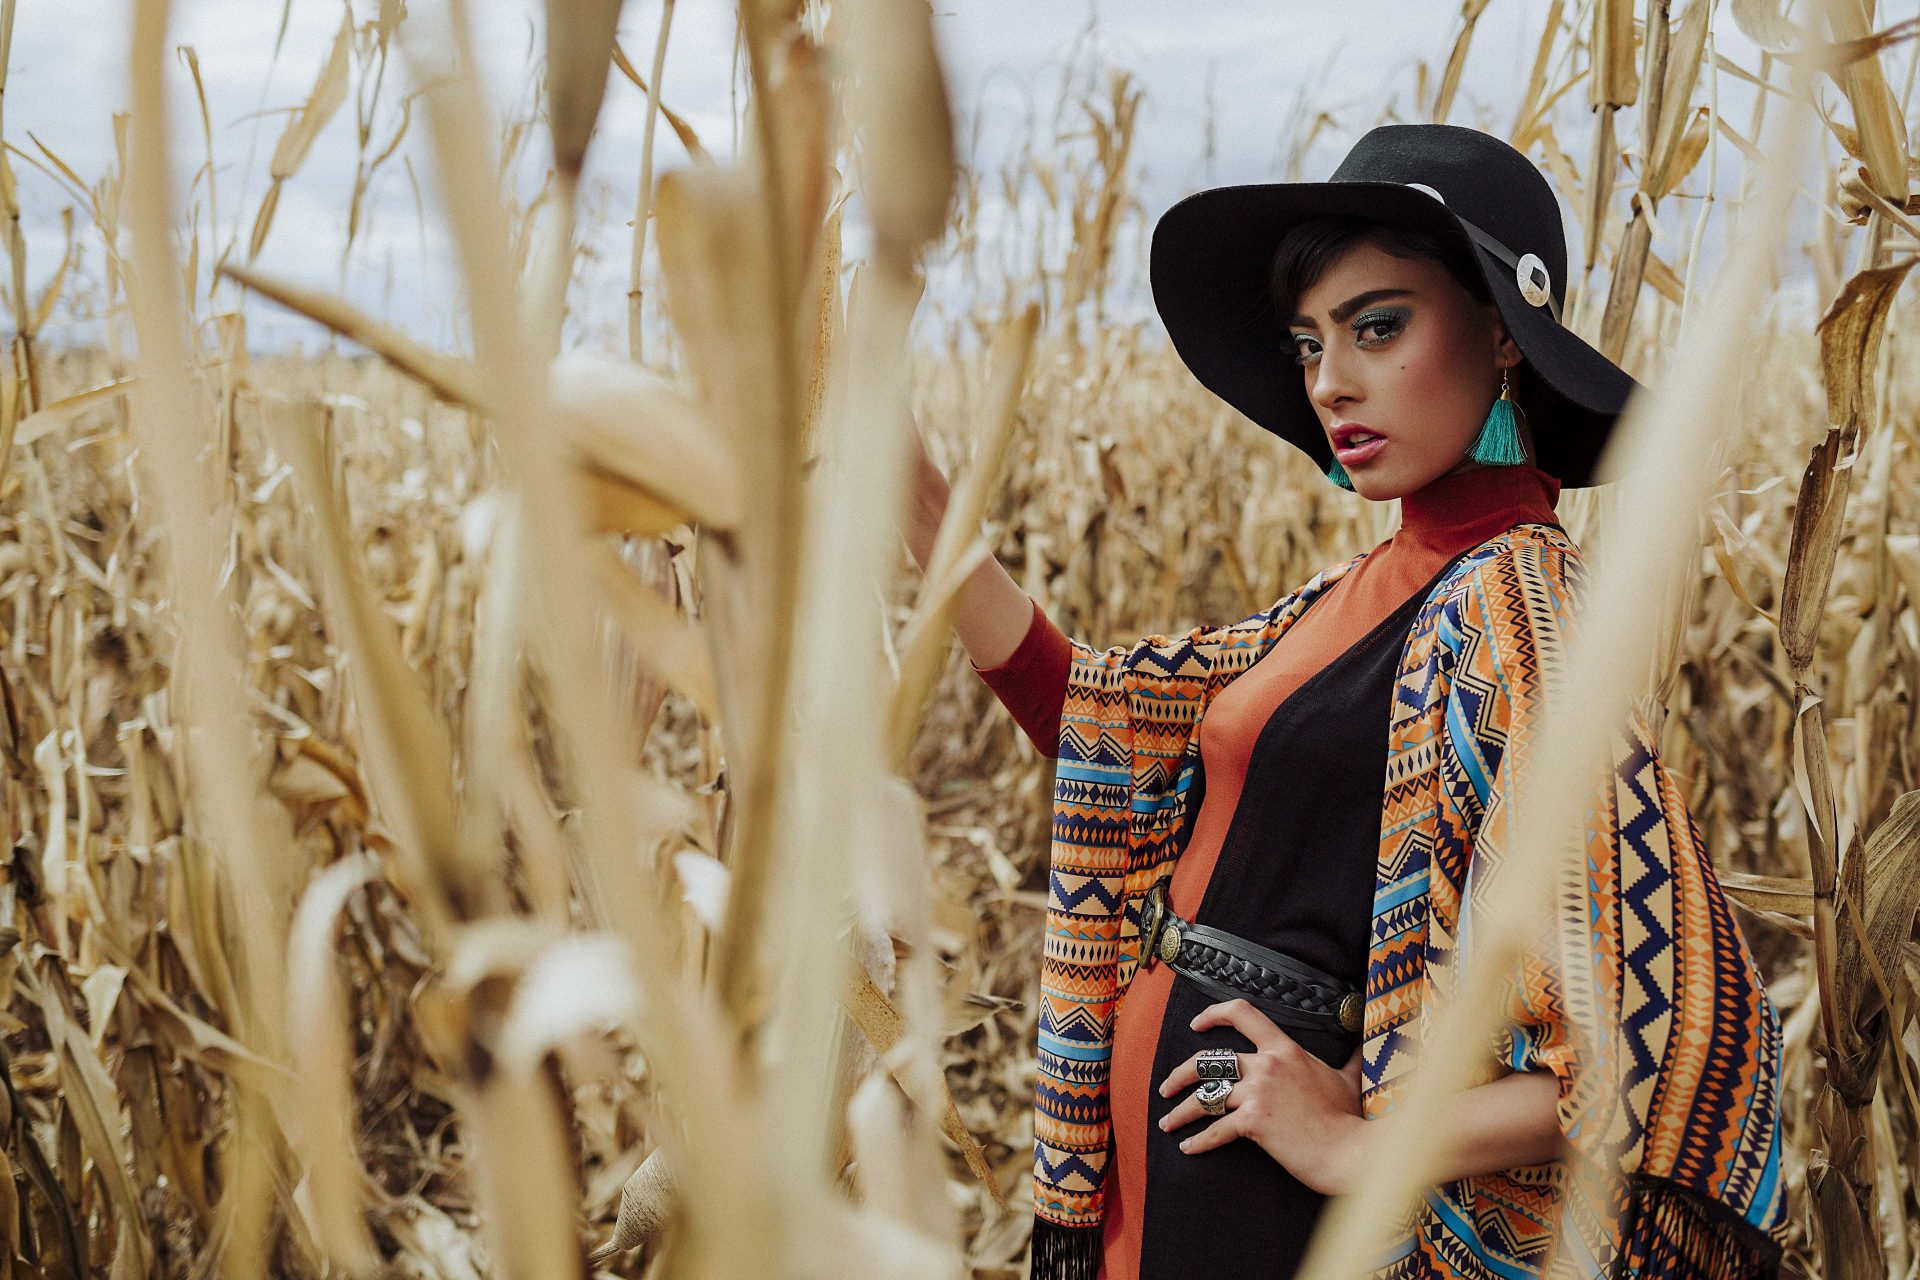 fotografo_profesional_bodas_casual_zacatecas_xv_mexico_chihuahua-3